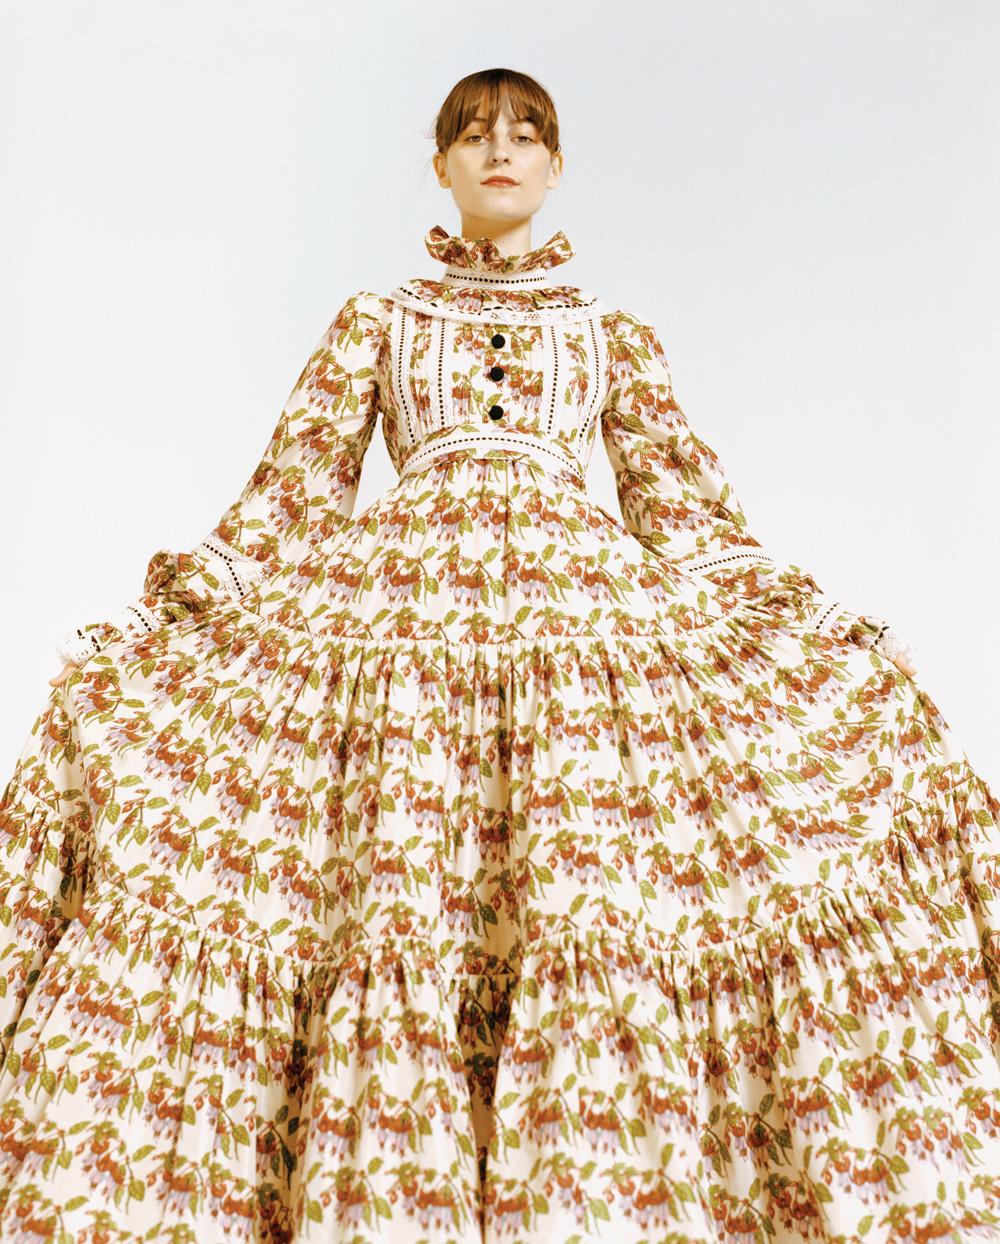 Faye Webster wearing a wide dress from Marc Jacobs